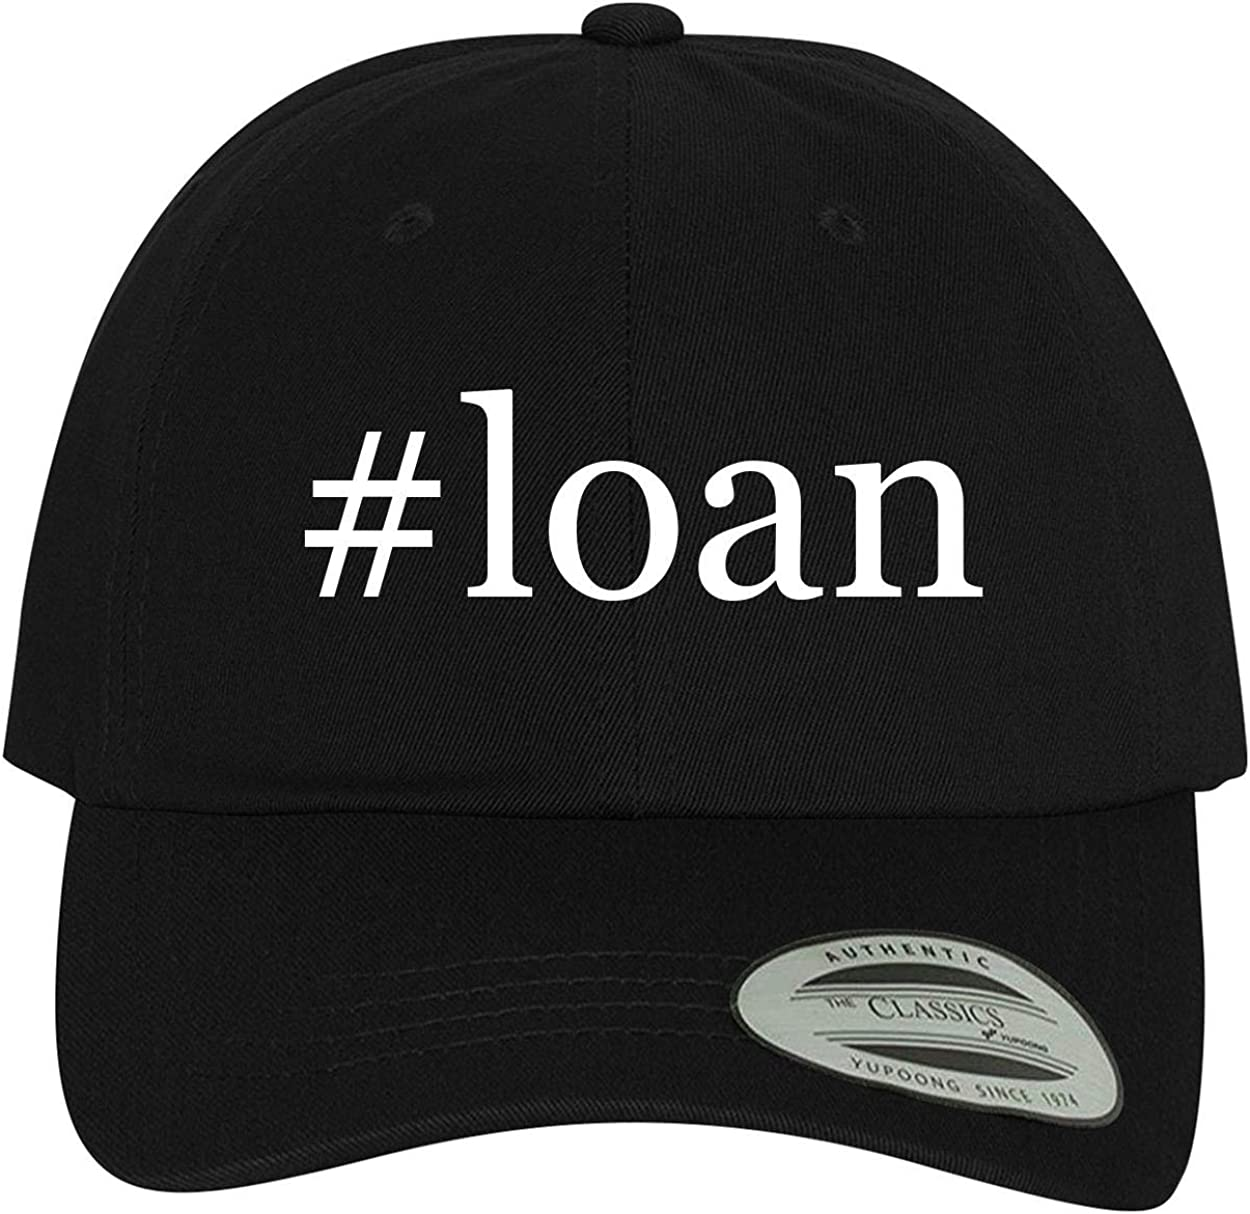 Comfortable Dad Hat Baseball Cap BH Cool Designs #Loan